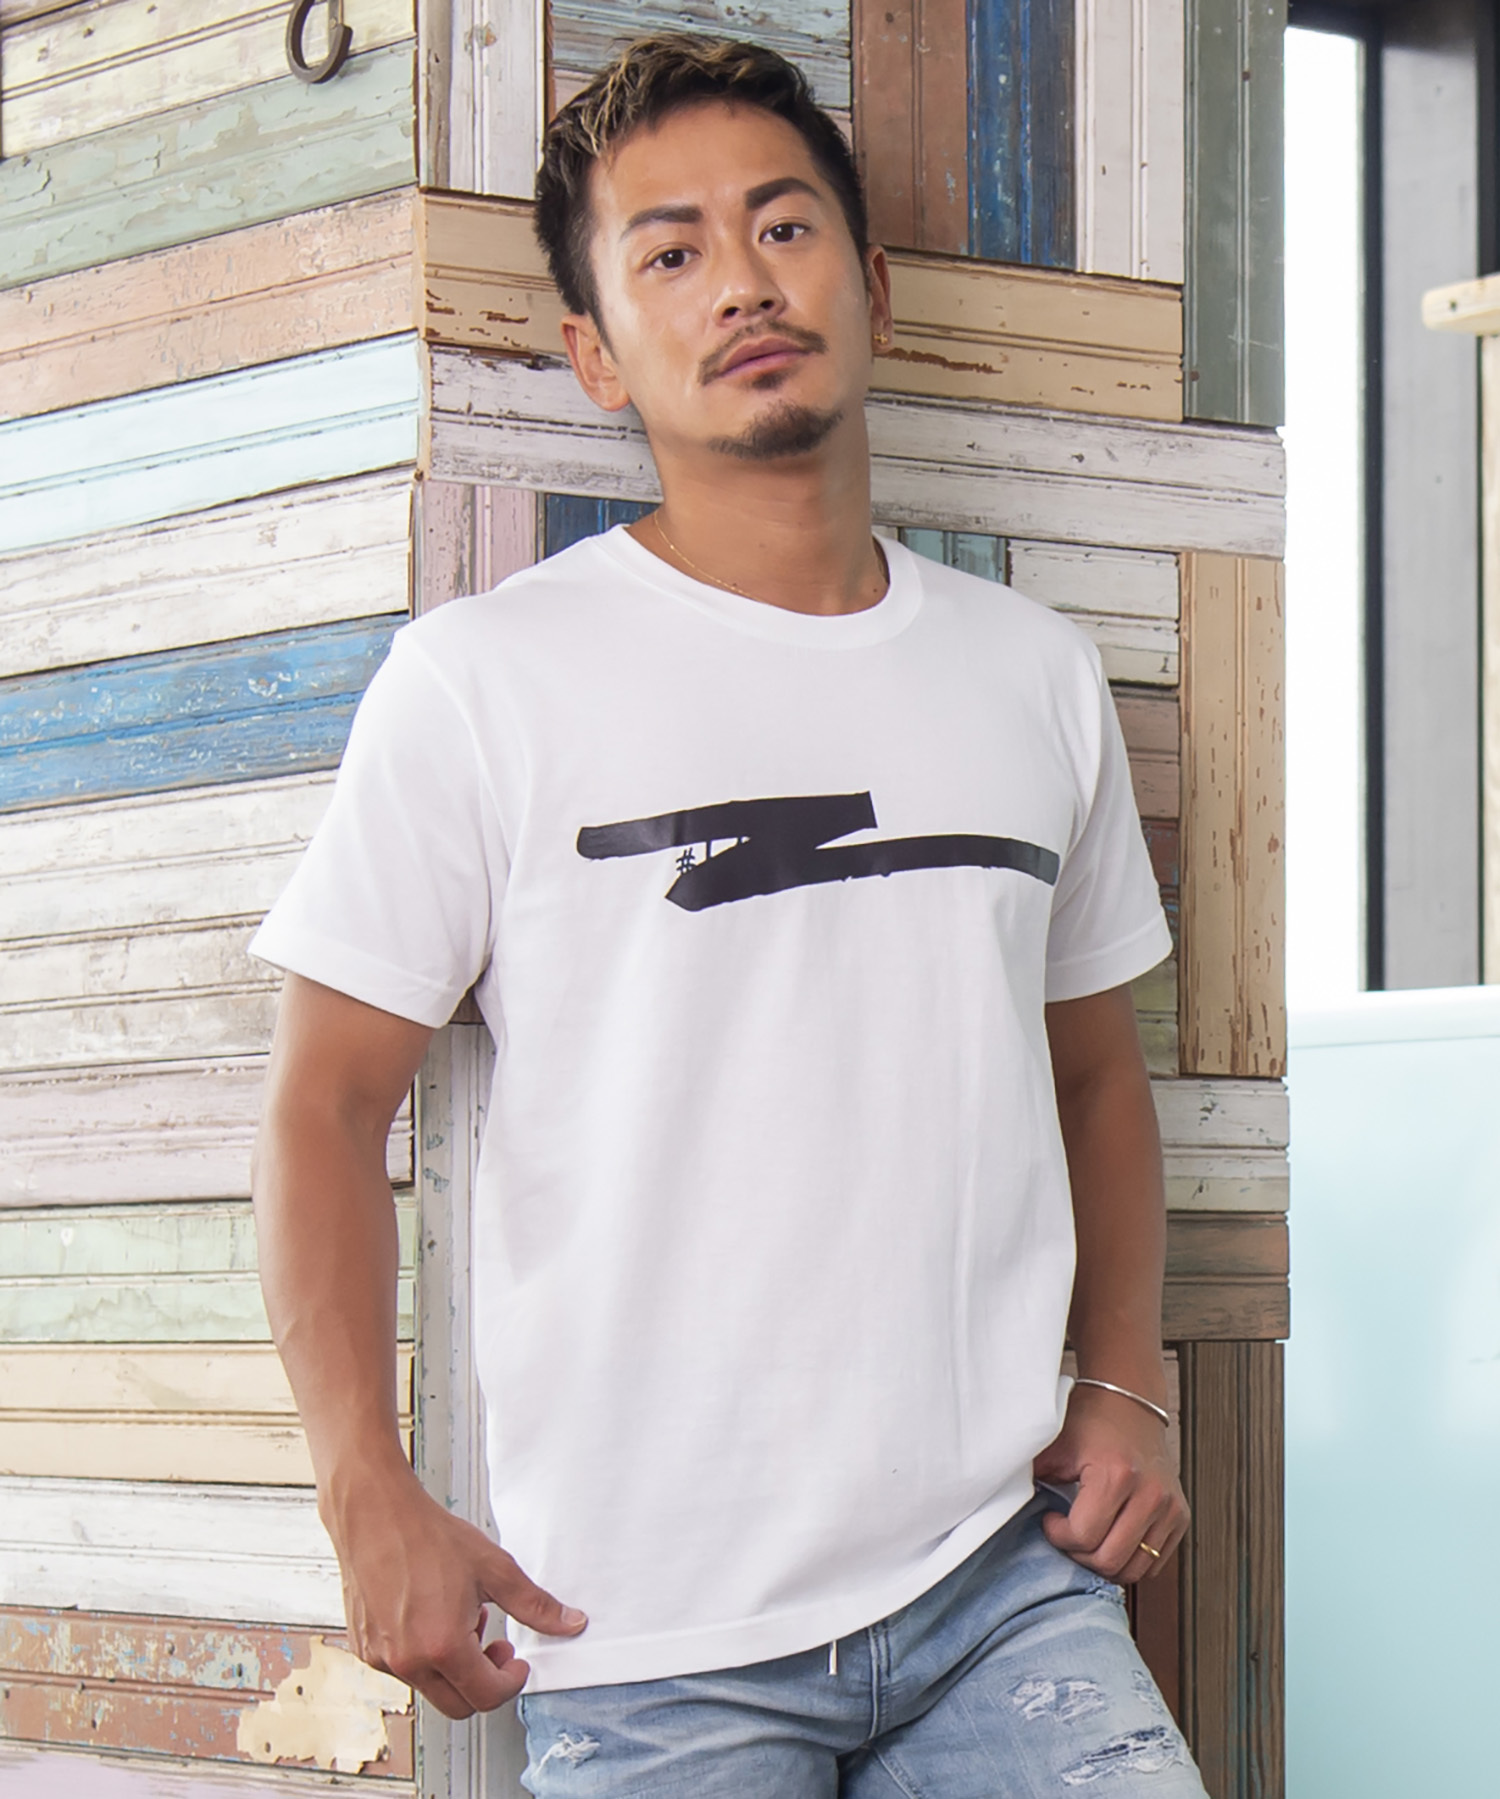 THERMO LOGO PRINT T-shirt[REC190]